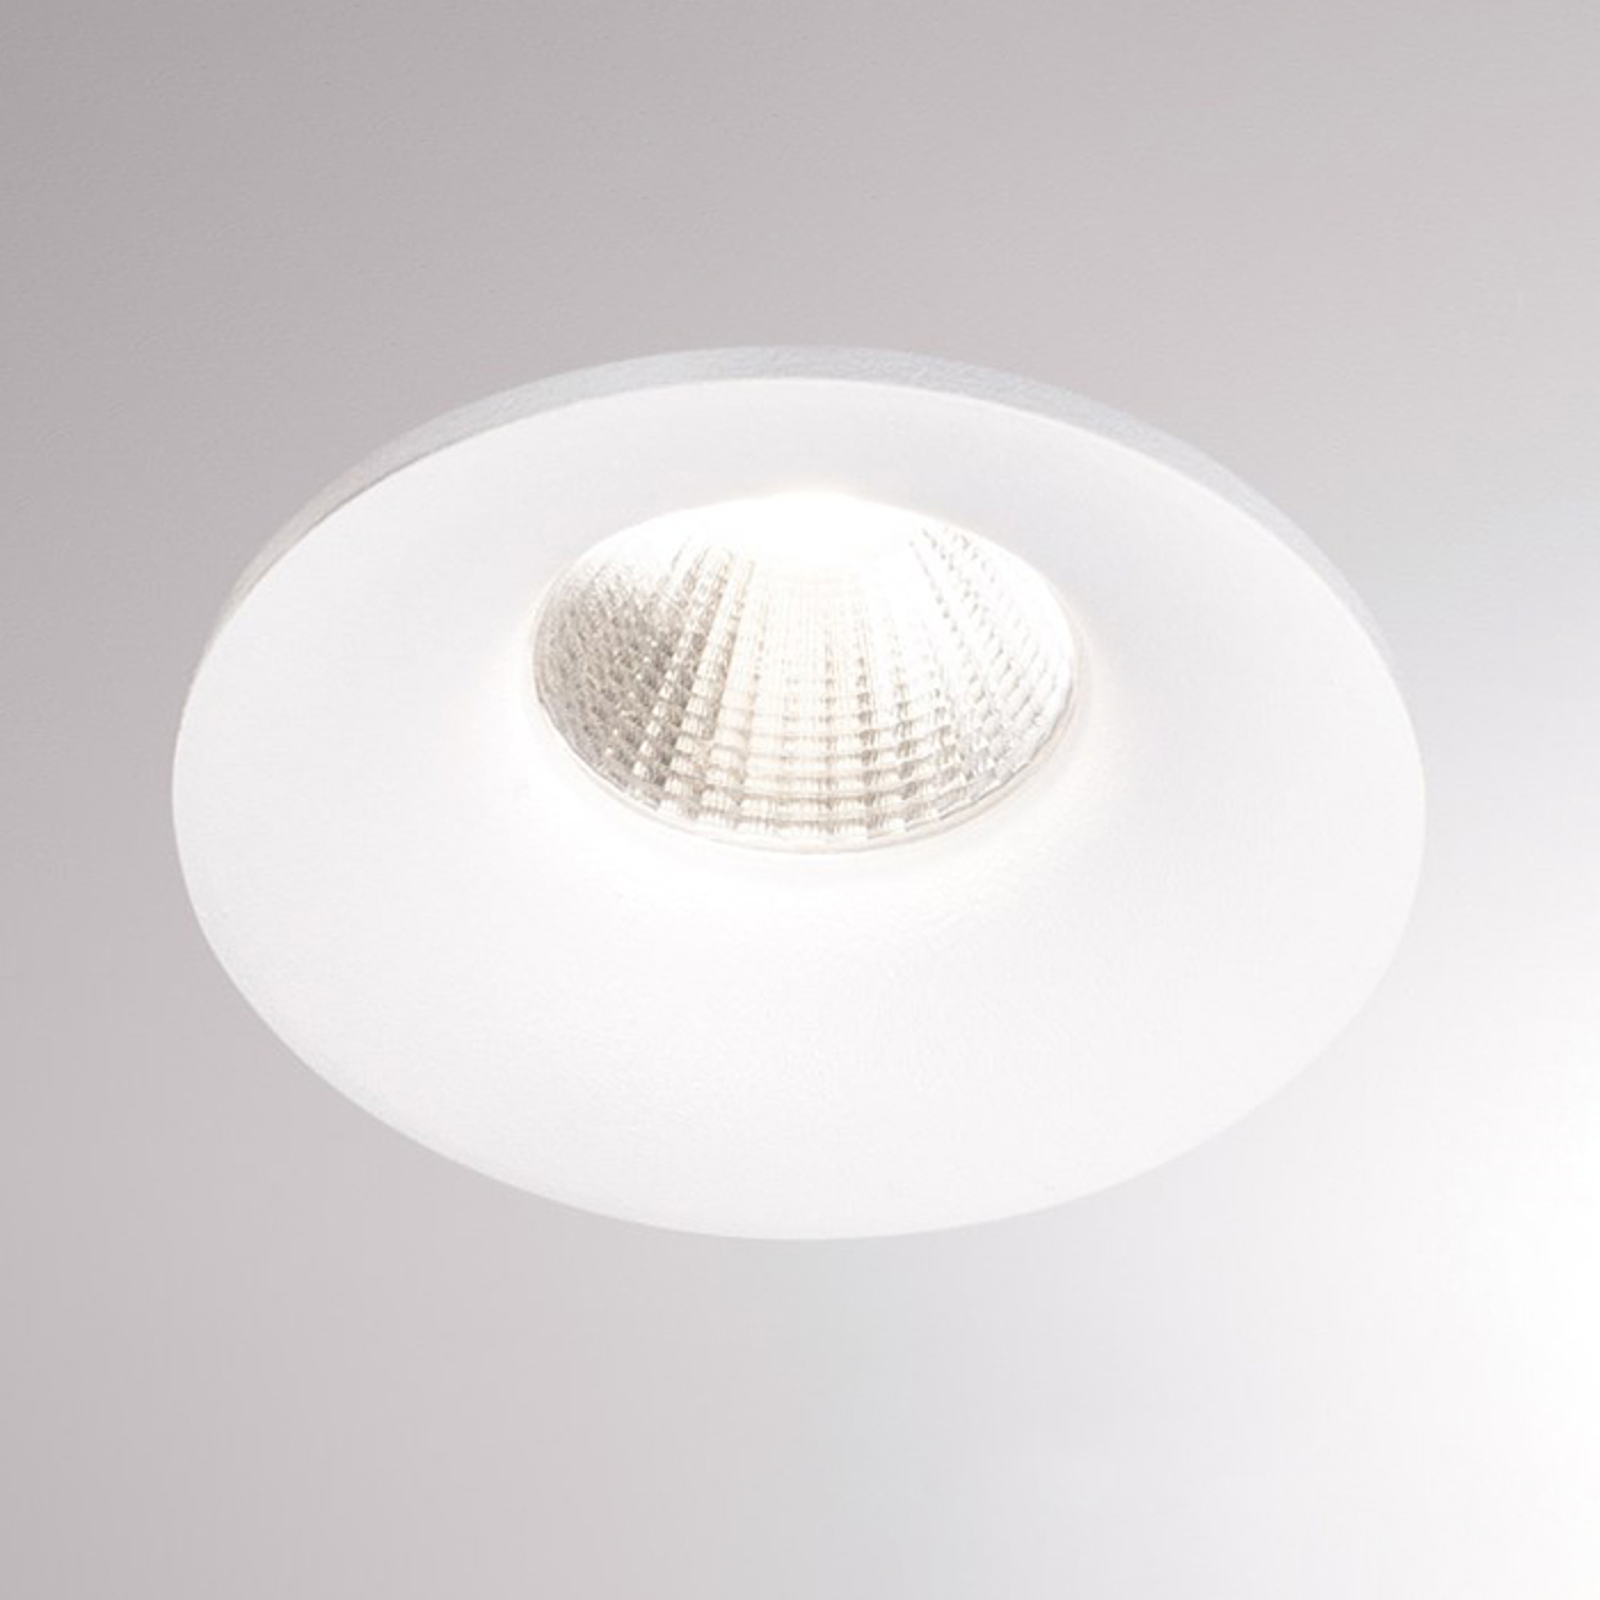 LED-Einbaustrahler Ivy Round 7W 3.000K 40° weiß